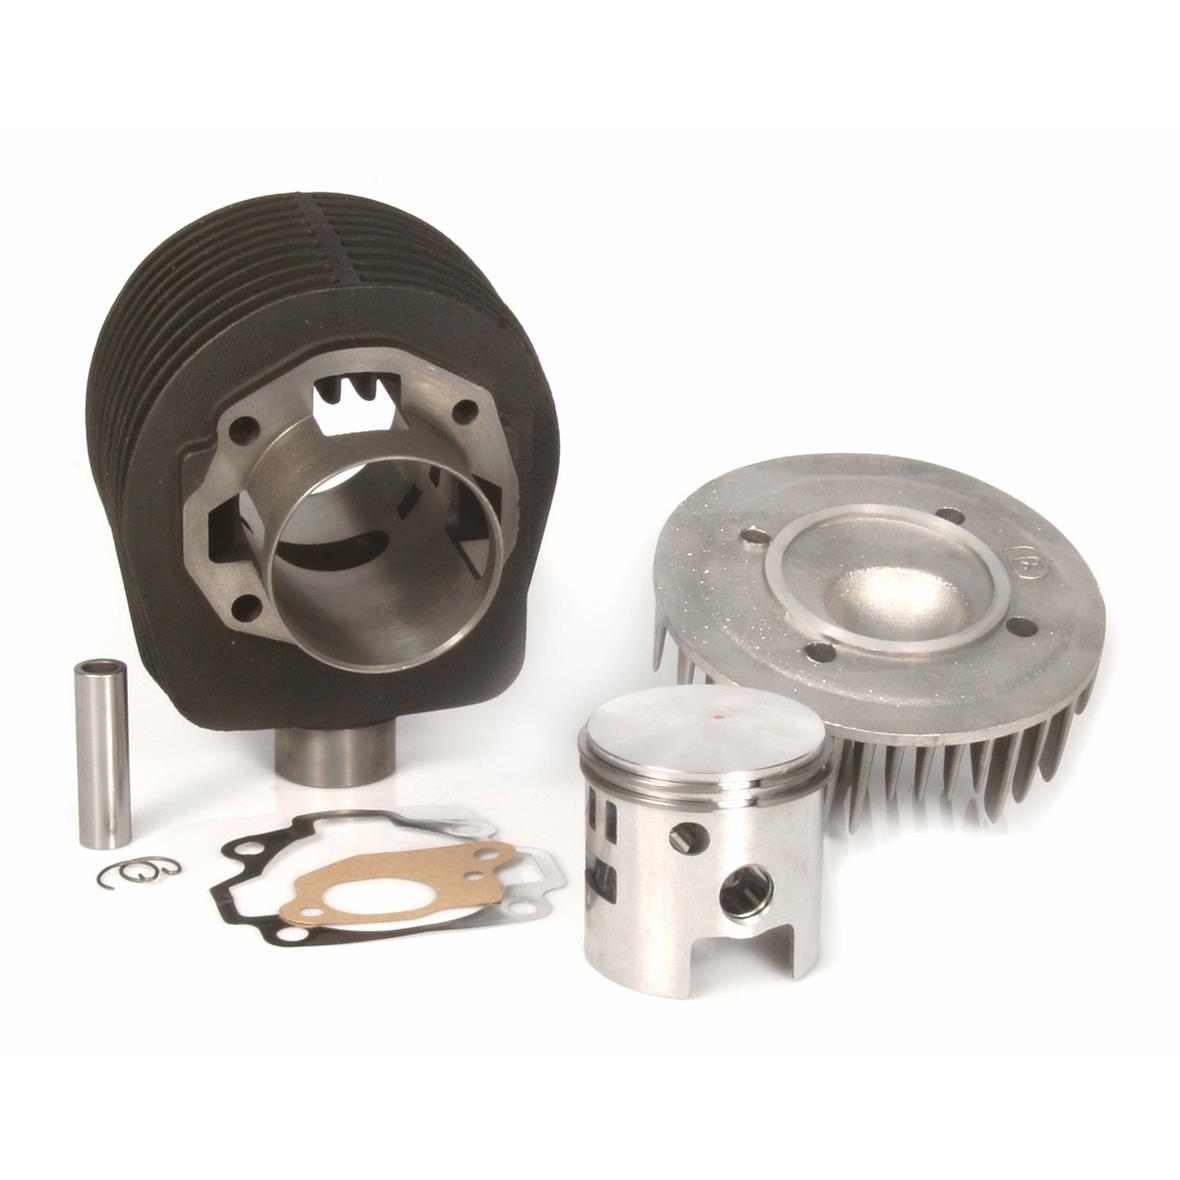 Zdjęcie produktu dla 'Cylinder rajdowy D.R. 177 ccmTitle'